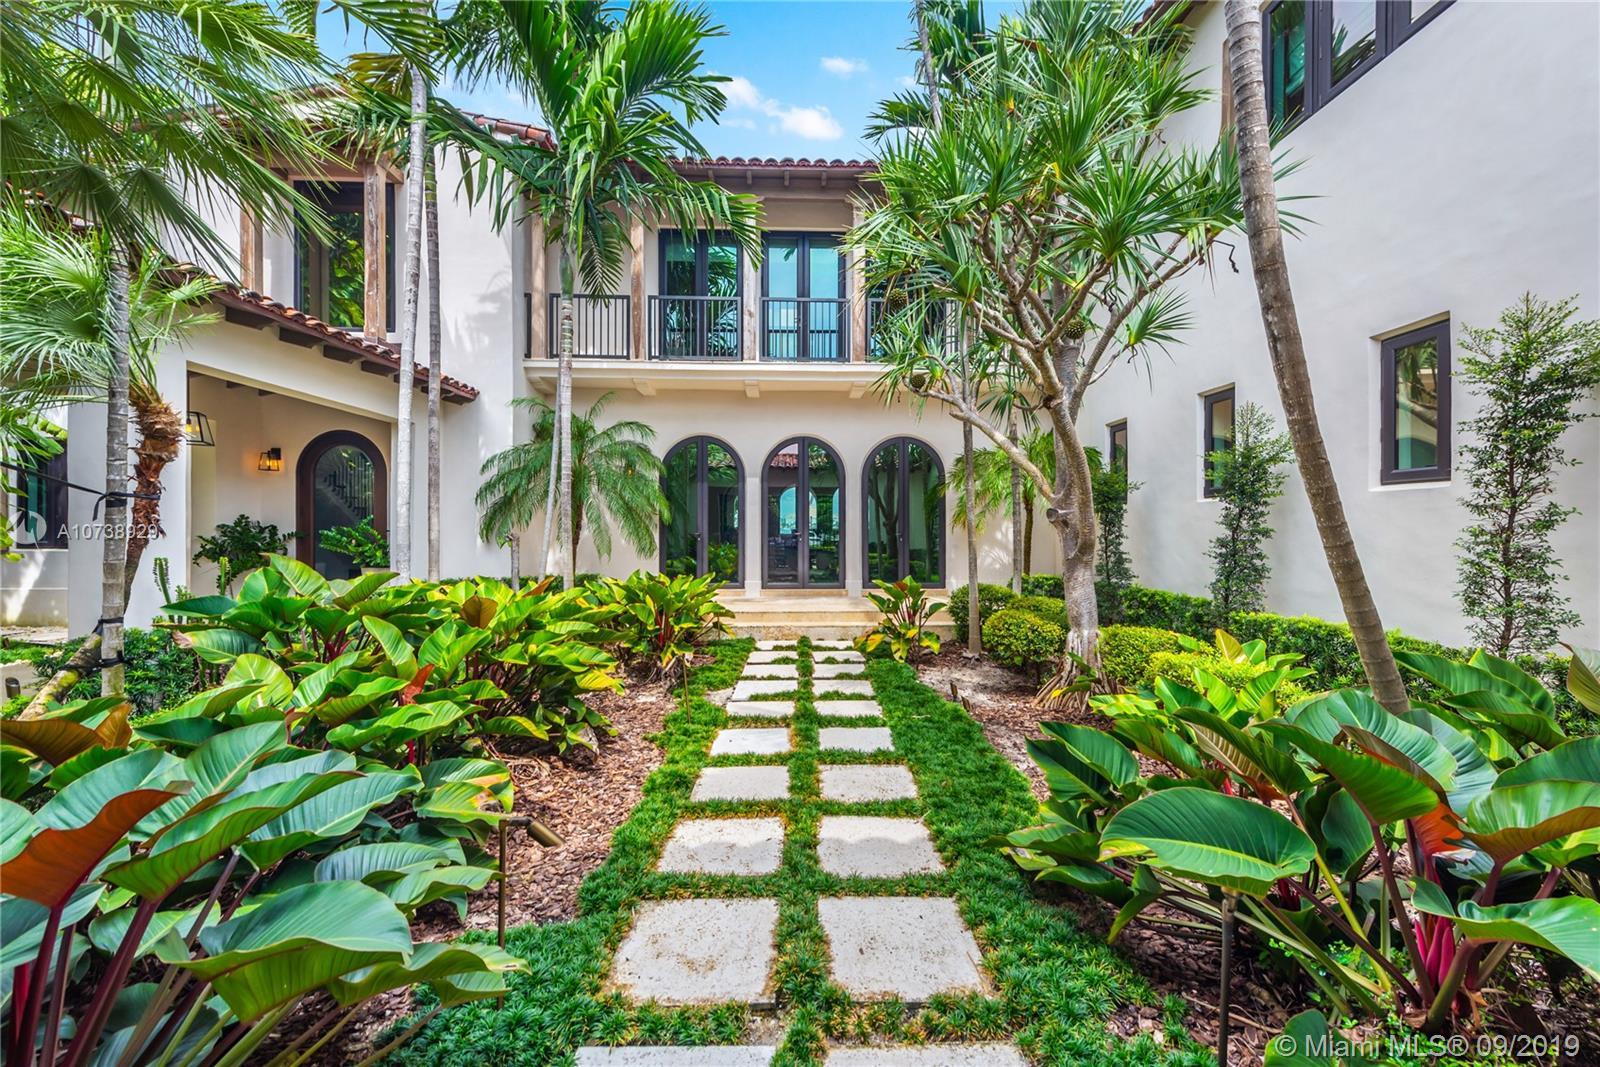 Homes for Sale in Zip Code 33140